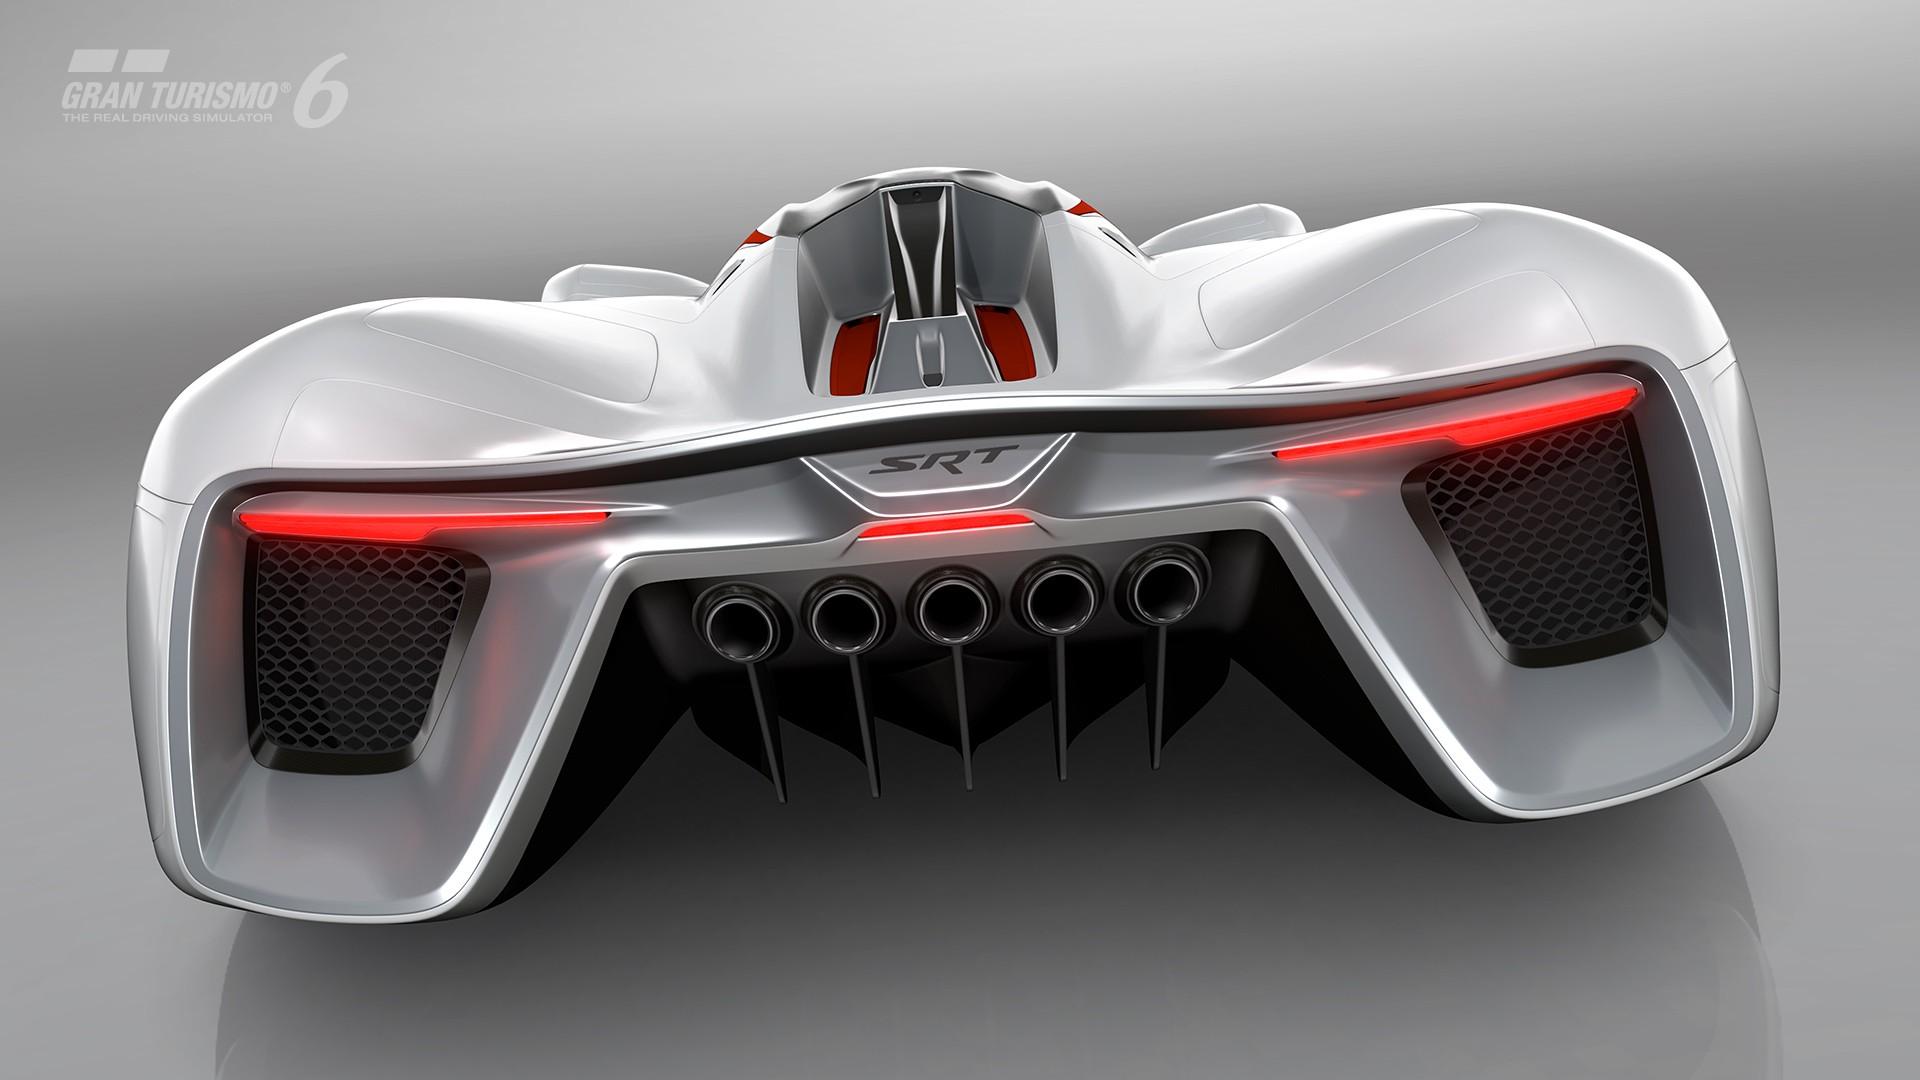 General 1920x1080 Vision Gran Turismo SRT concept car Dodge